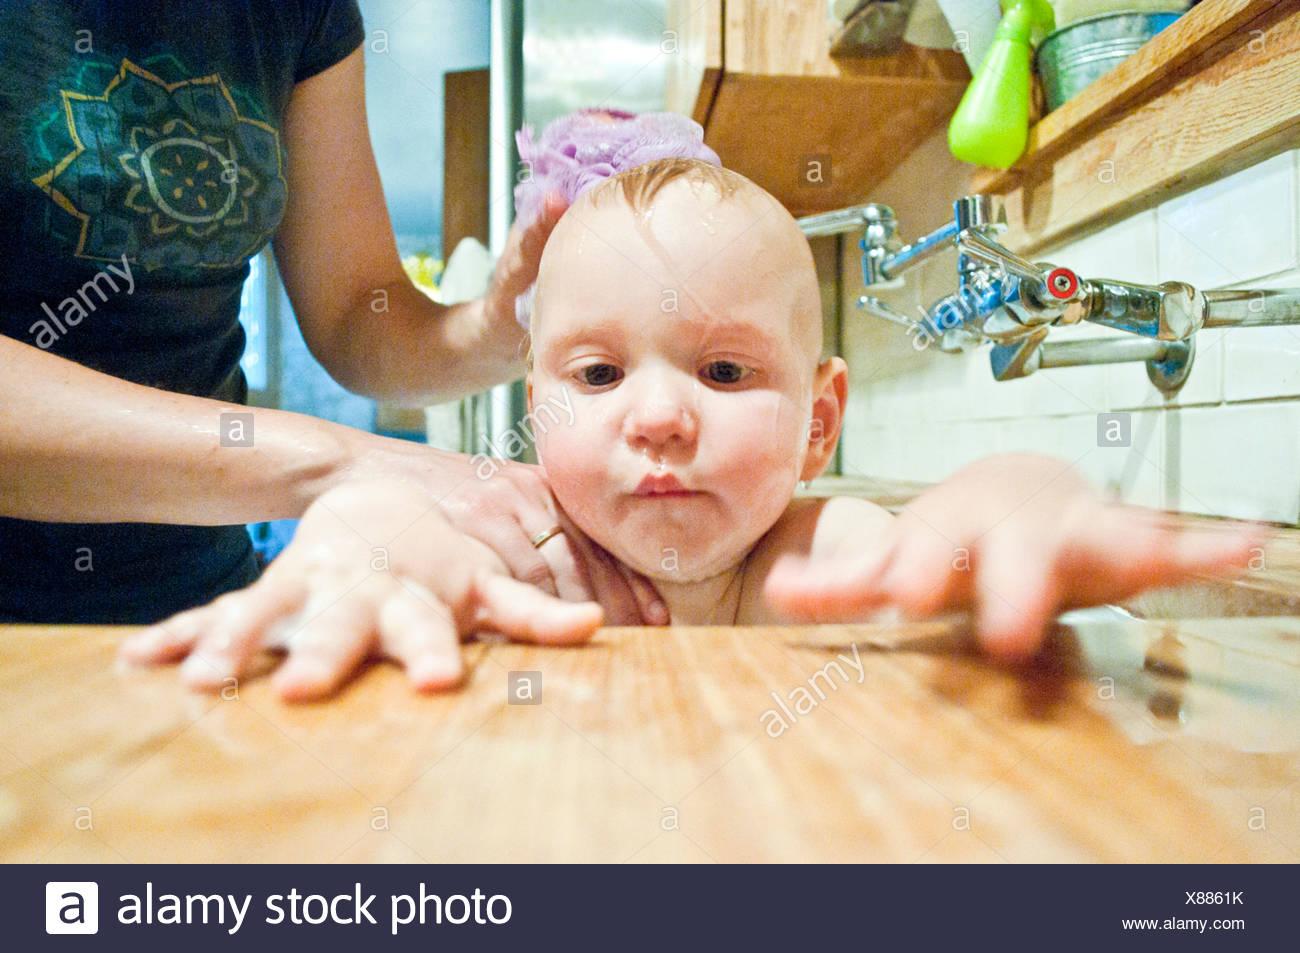 Woman Bathing Baby In Sink Stock Photos & Woman Bathing Baby In Sink ...